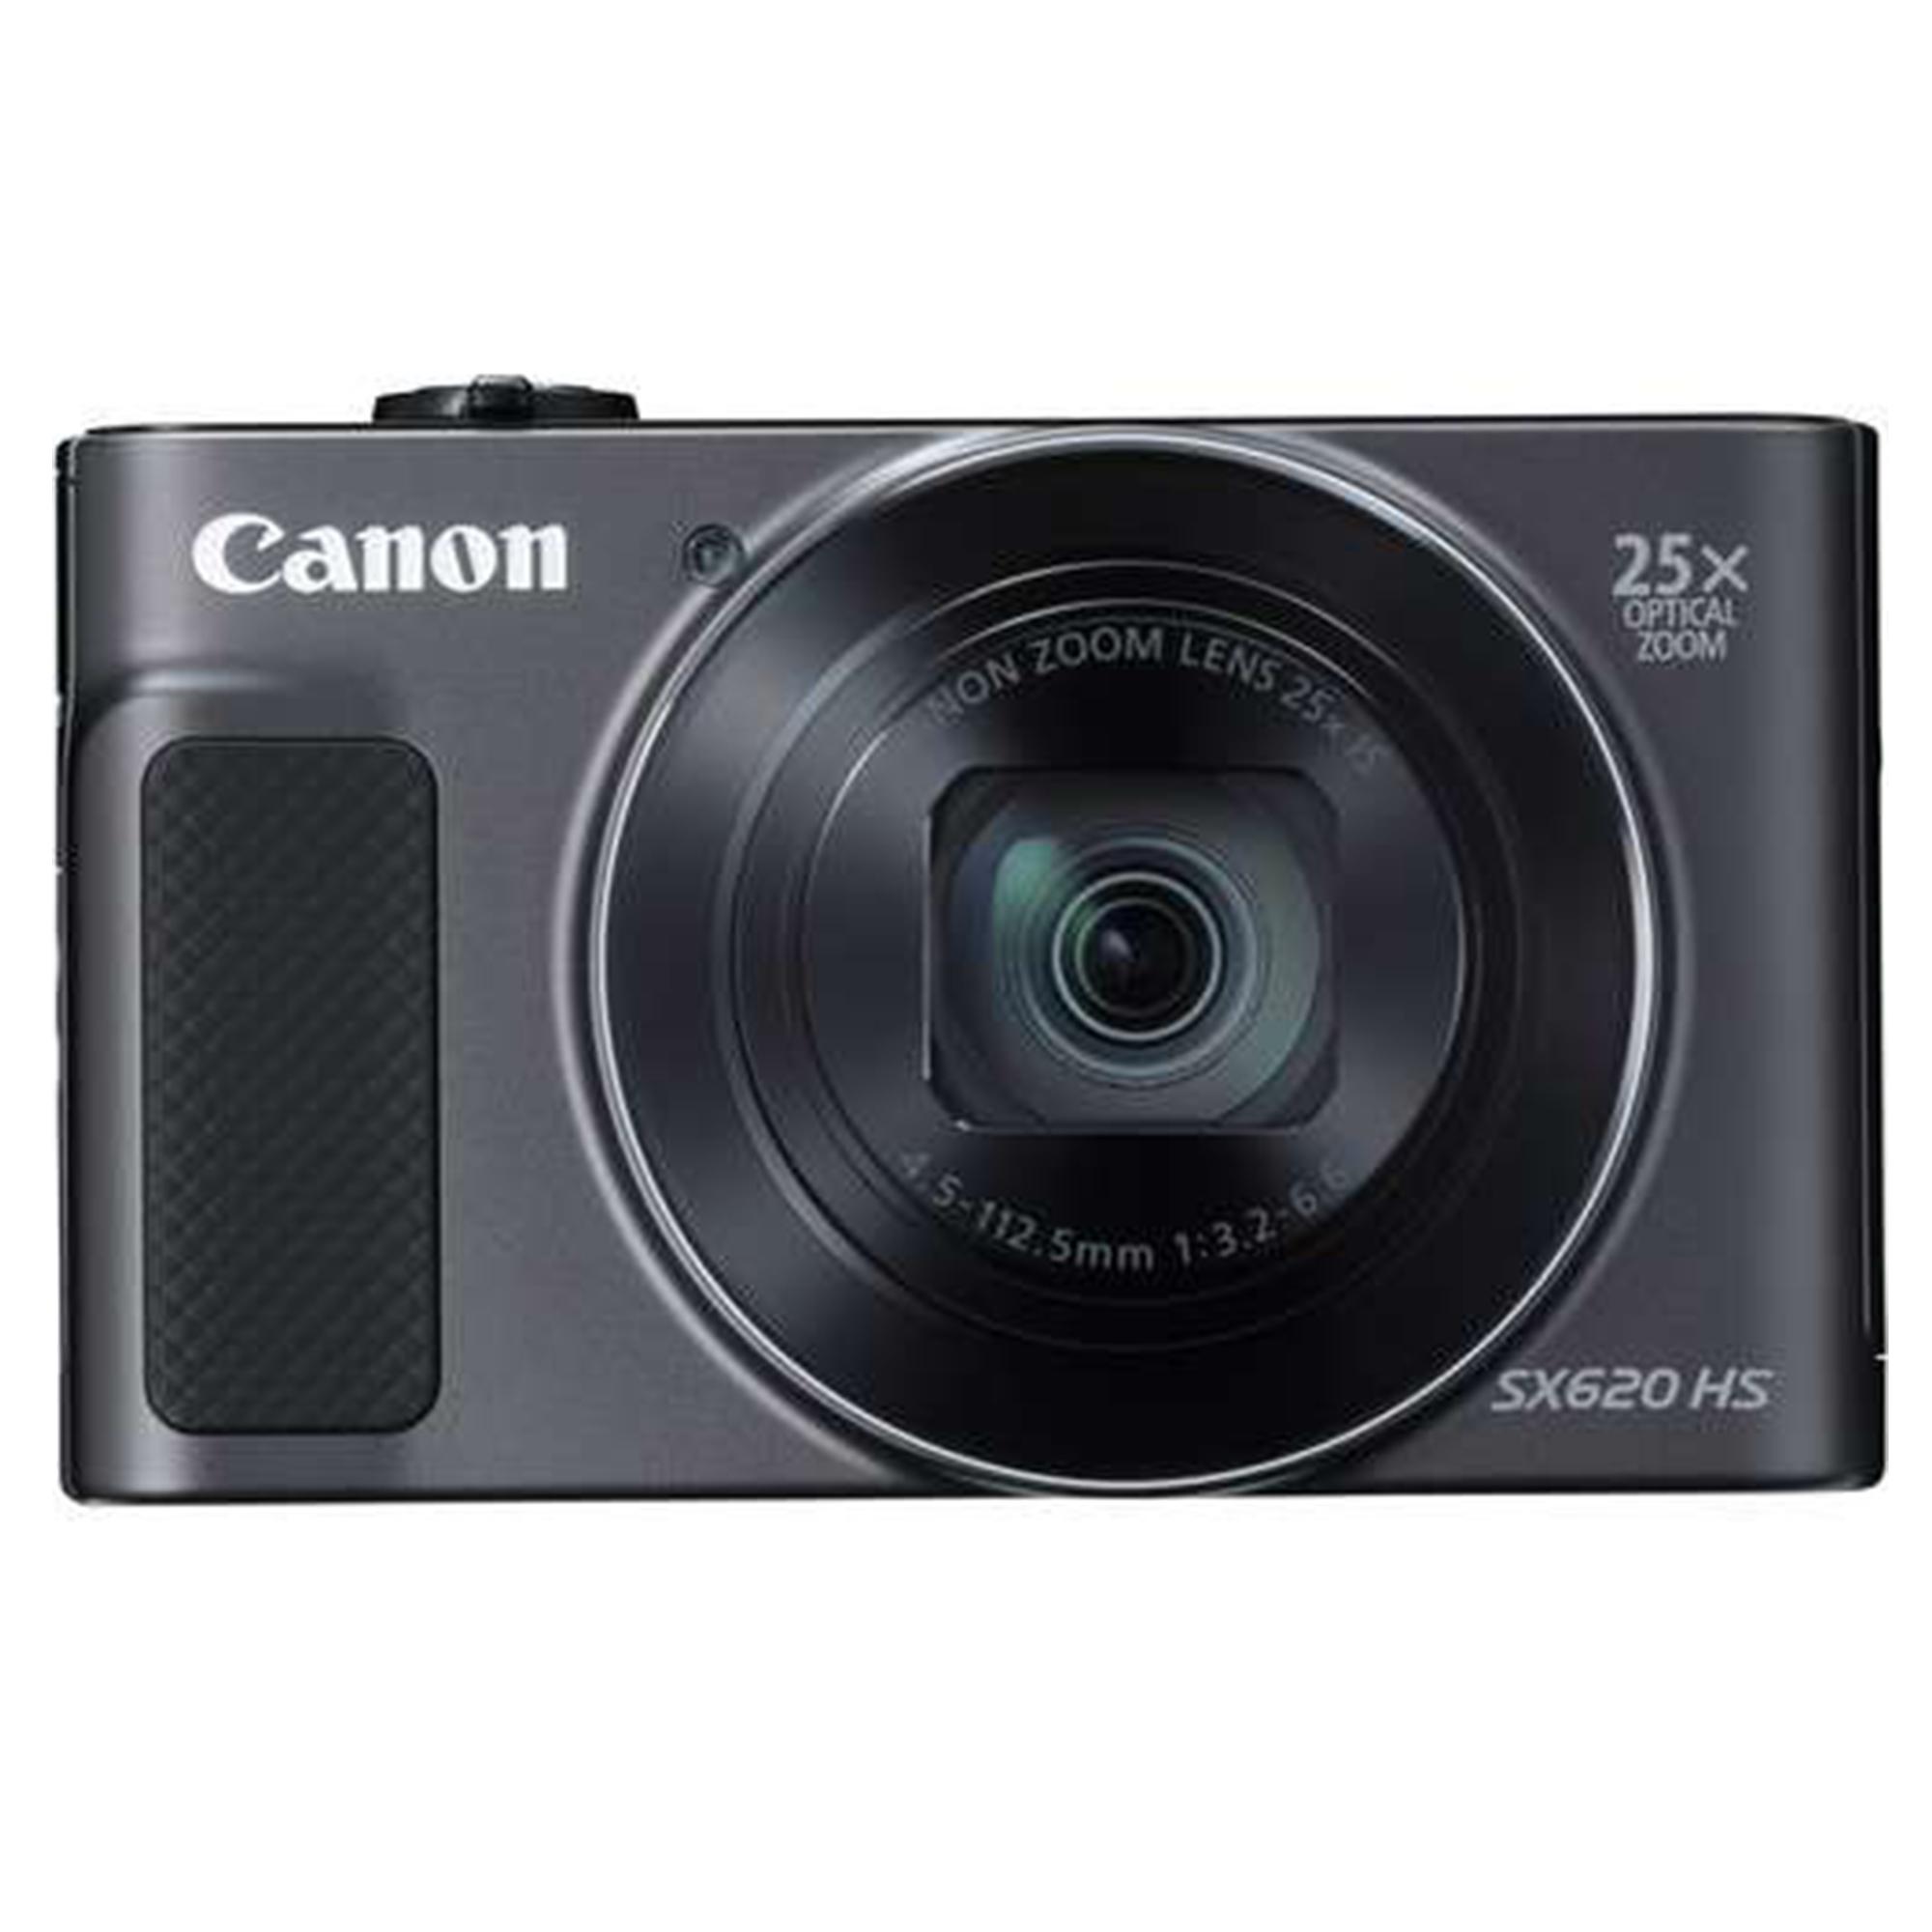 Canon PowerShot SX620 HS Black + free Gift vanguard BIIN 7H & 8GB Memory card